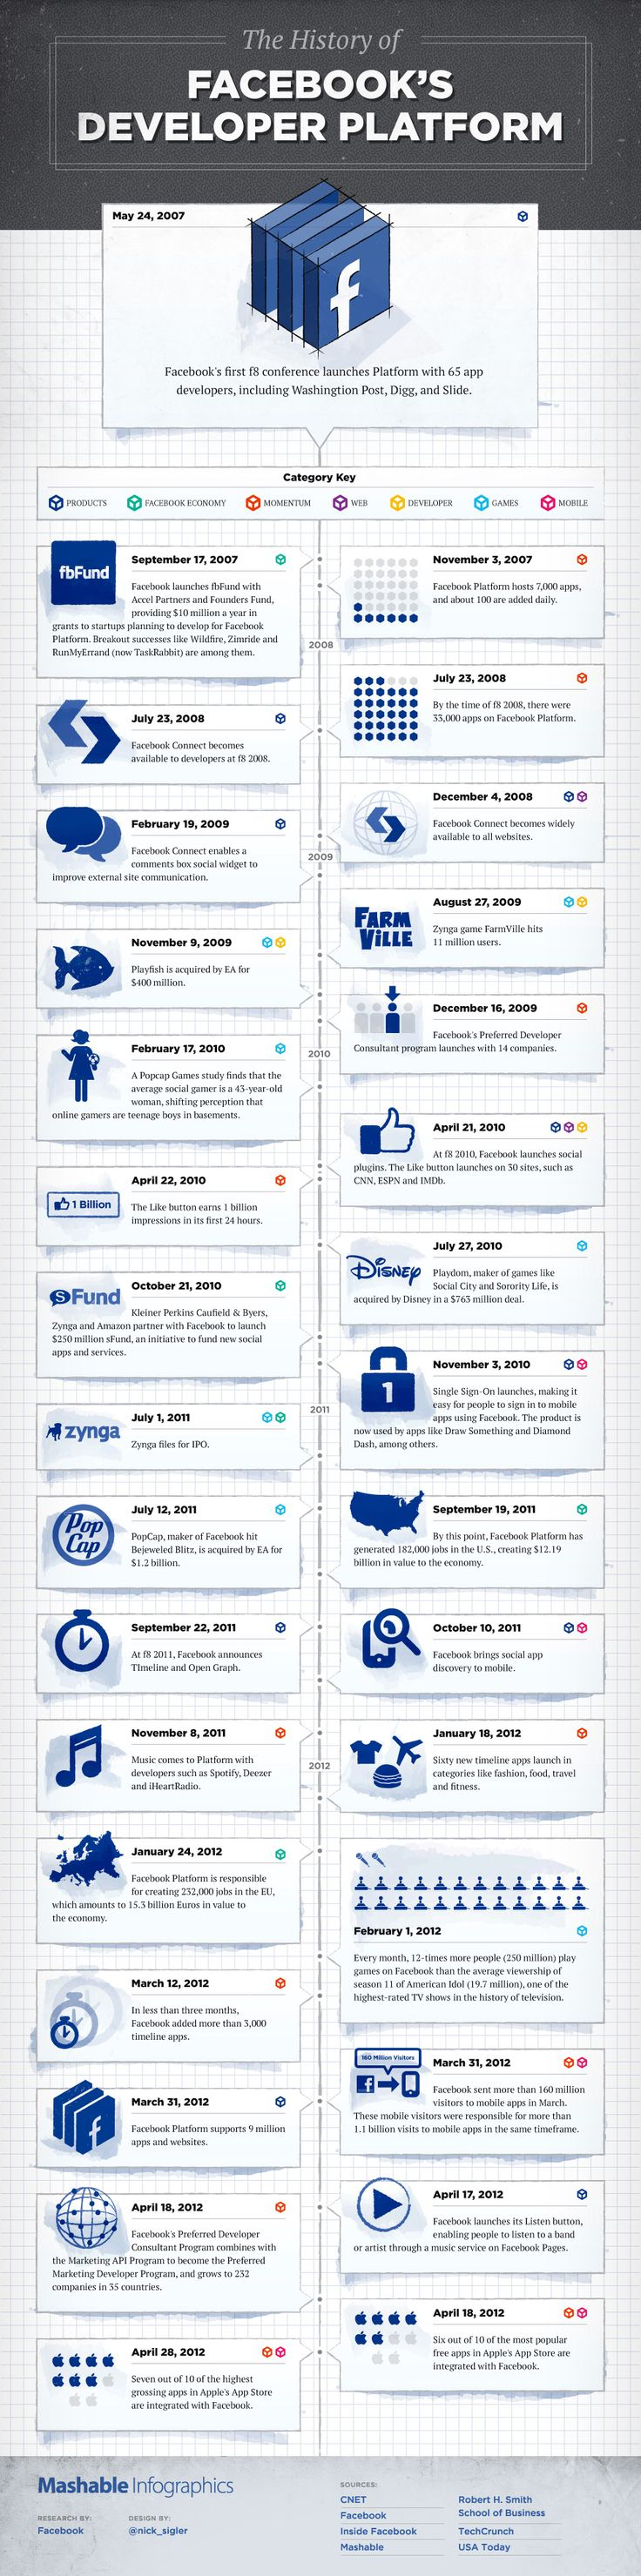 The Chronicles of Facebook's Developer PlatformDigital Marketing, Development Infographic, Social Media, Platforminfograph Facebooktip, Platform Infographic, Media Infographic, Facebook Development, Development Platforminfograph, Marketing Infographic